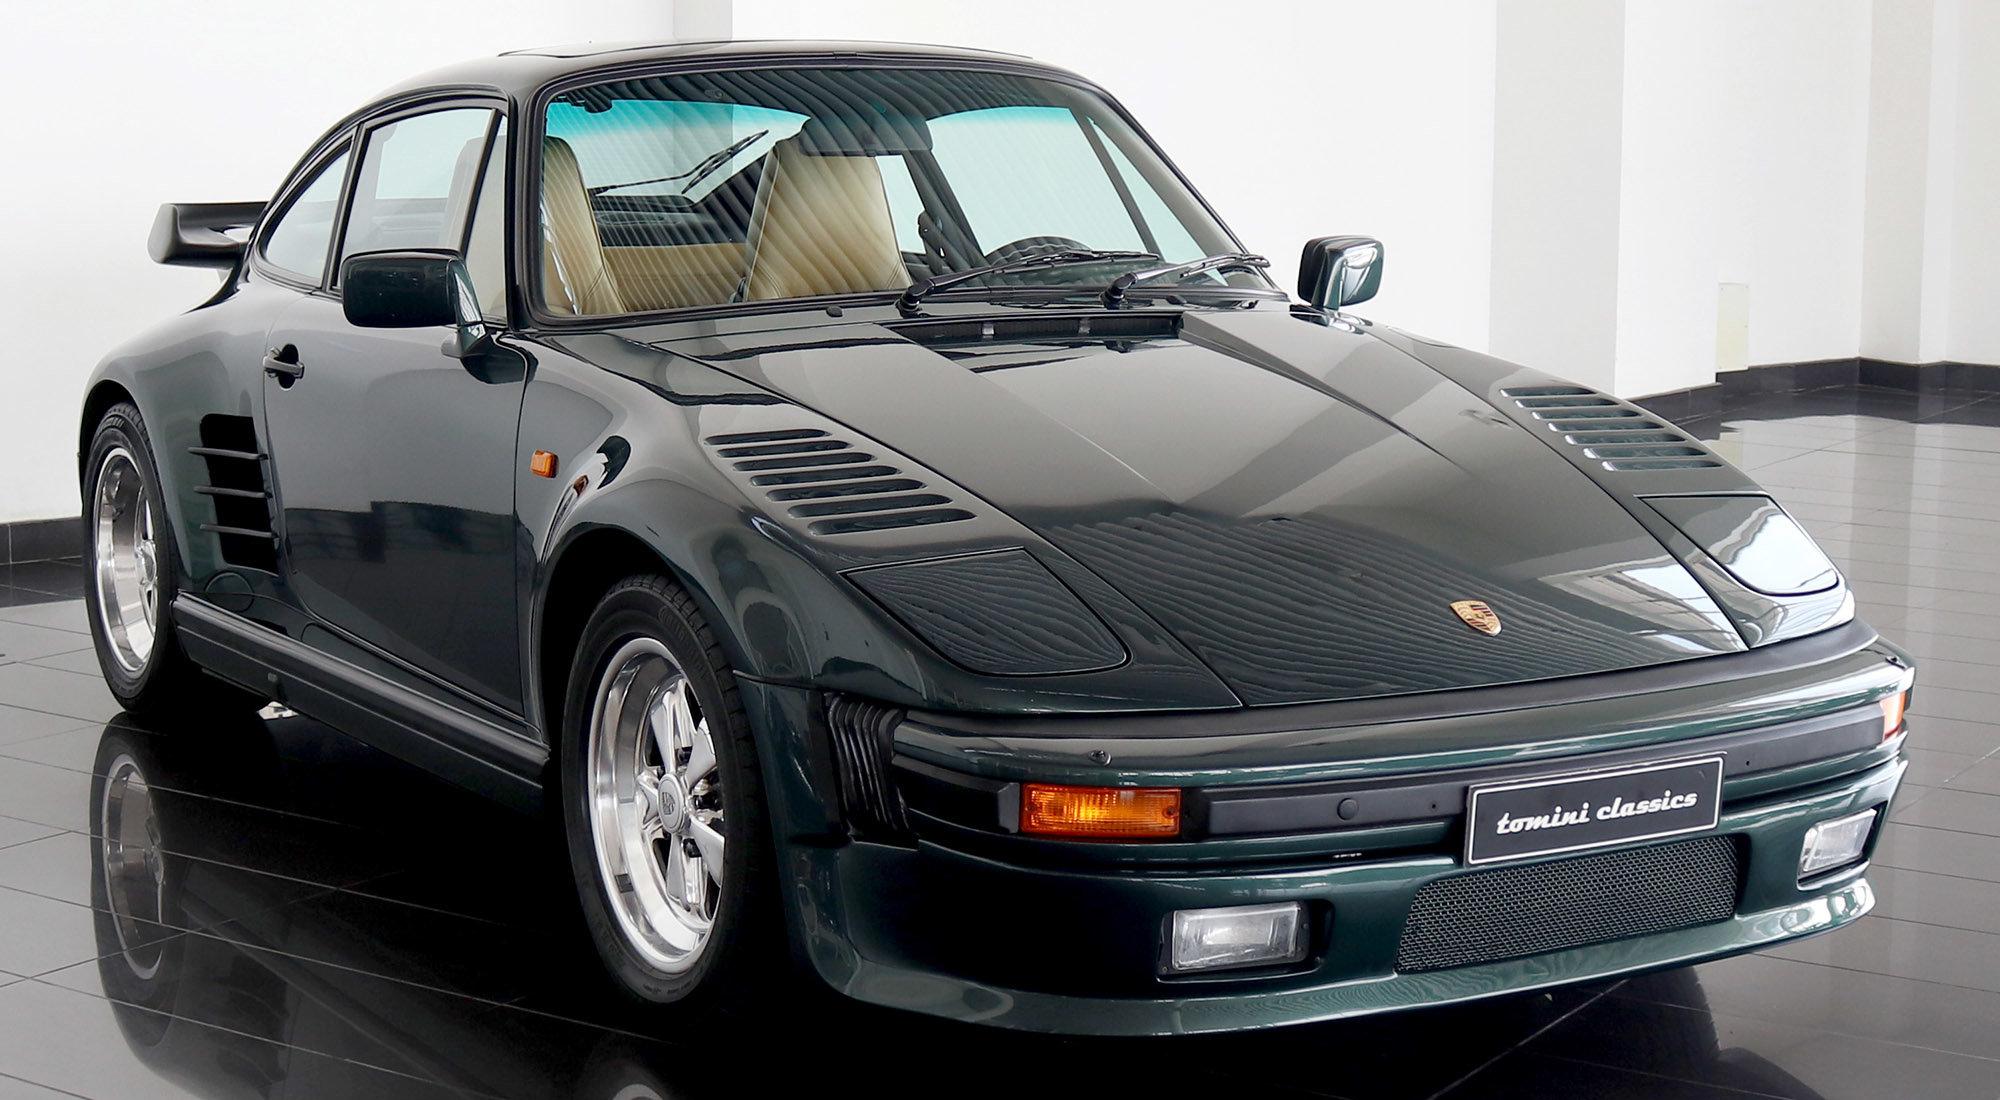 Porsche 930 SE Slantnose / Flachbau (1986) For Sale (picture 1 of 6)